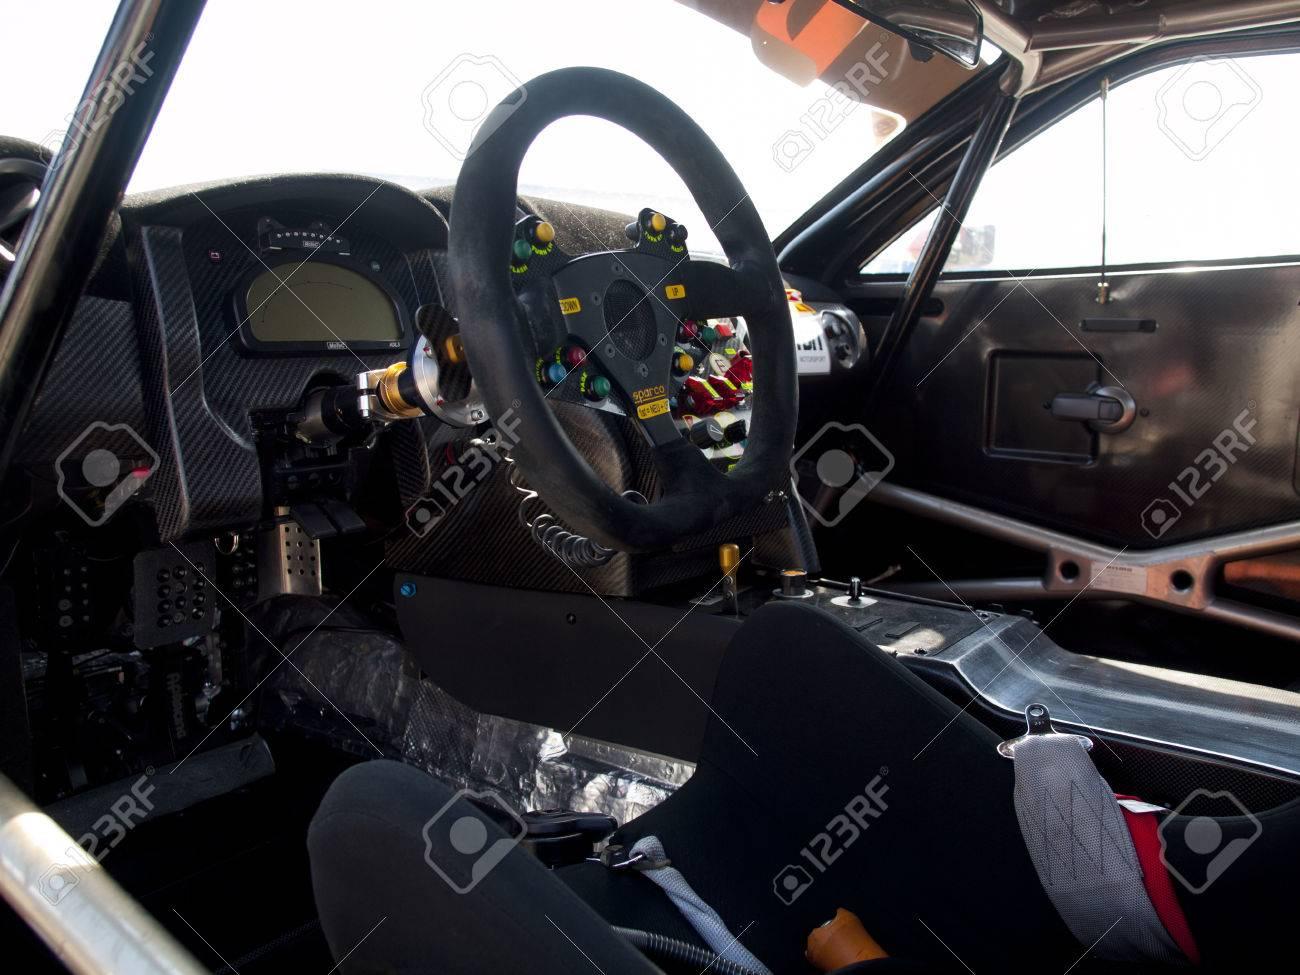 ZANDVOORT, NETHERLANDS - JULY 7: The cockpit of a McLaren GT